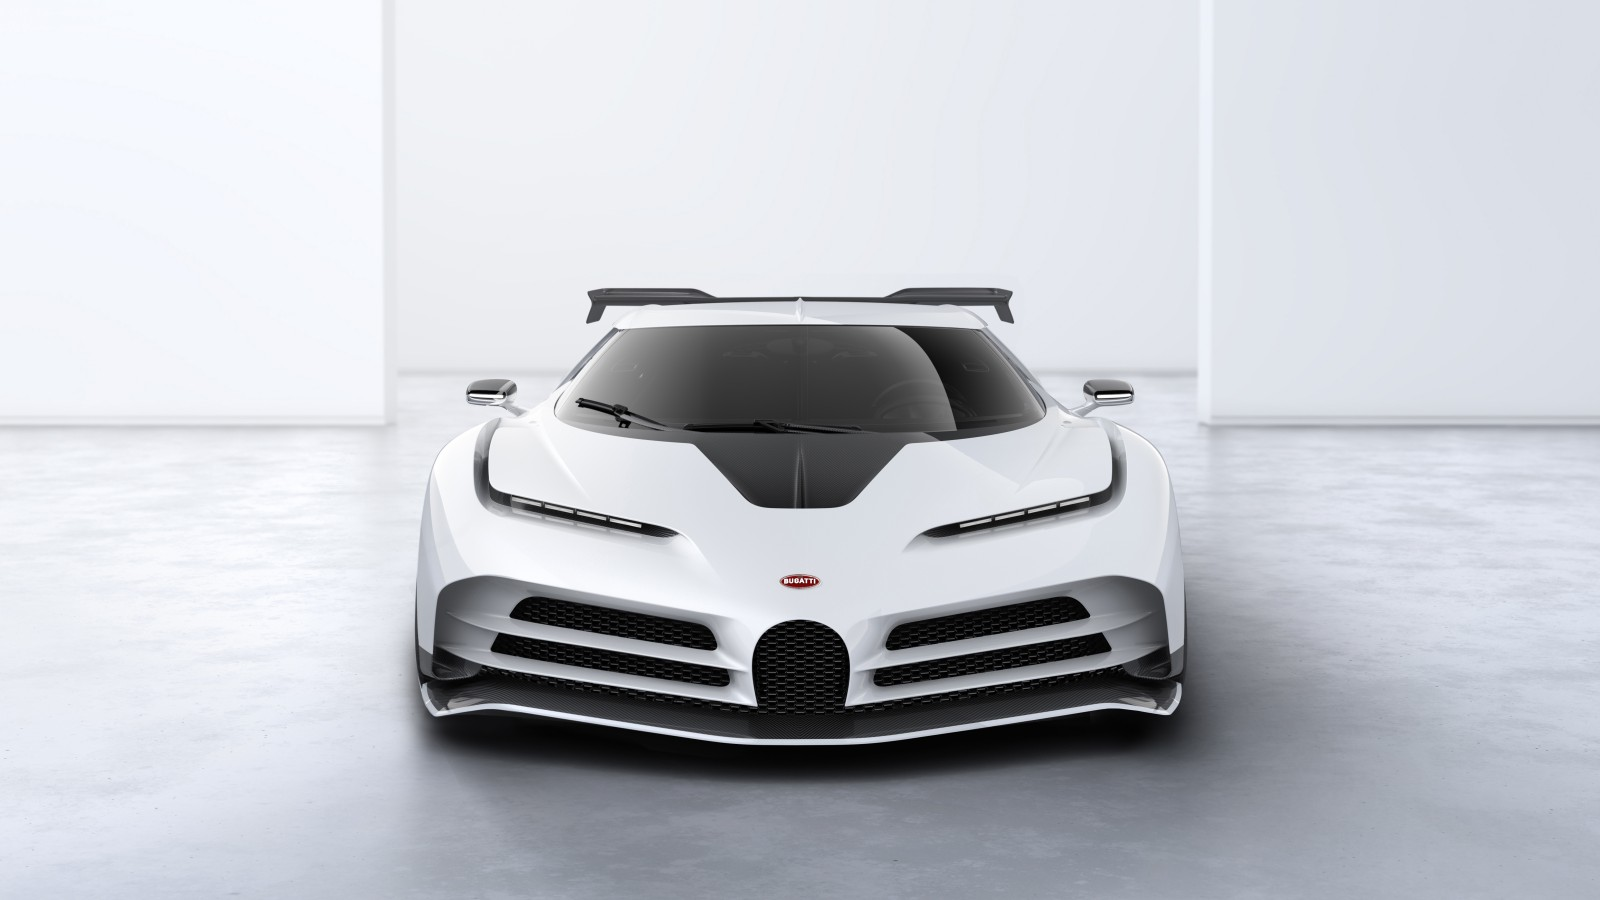 Bugatti Centodieci 2019 4K 5K Wallpaper | HD Car ...